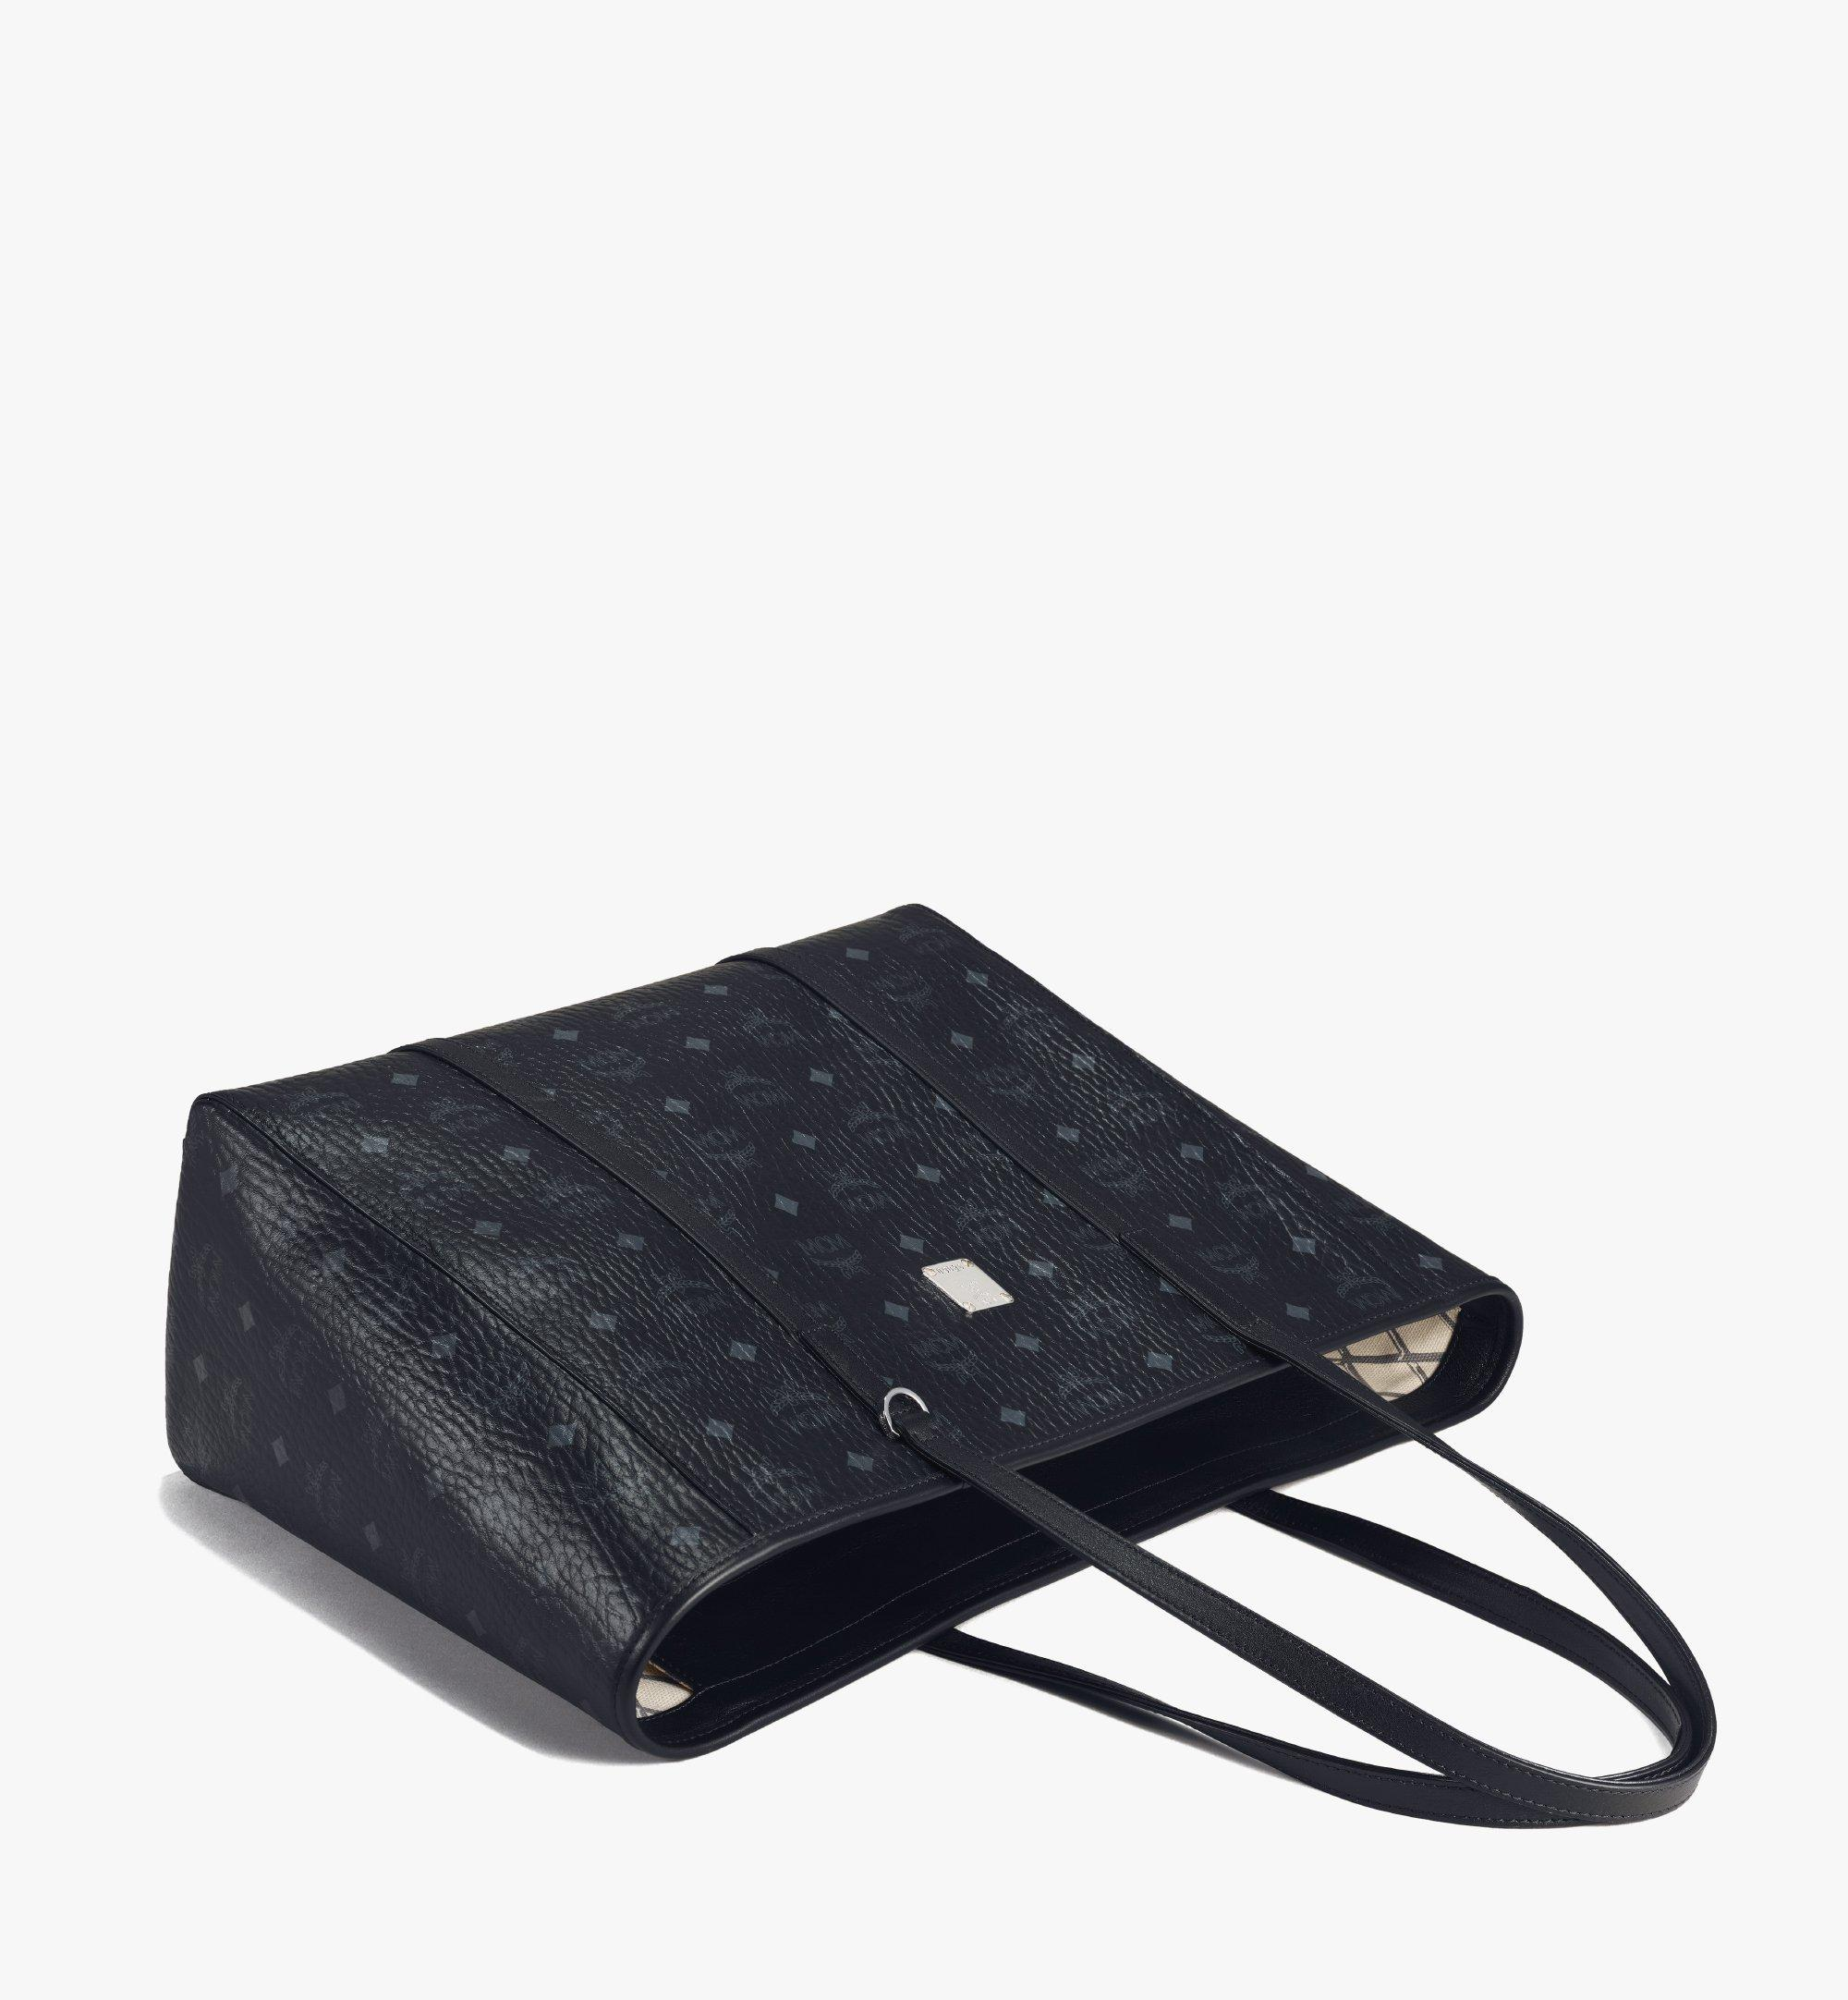 MCM Toni E/W Shopper in Visetos Black MWPAATN01BK001 Alternate View 2